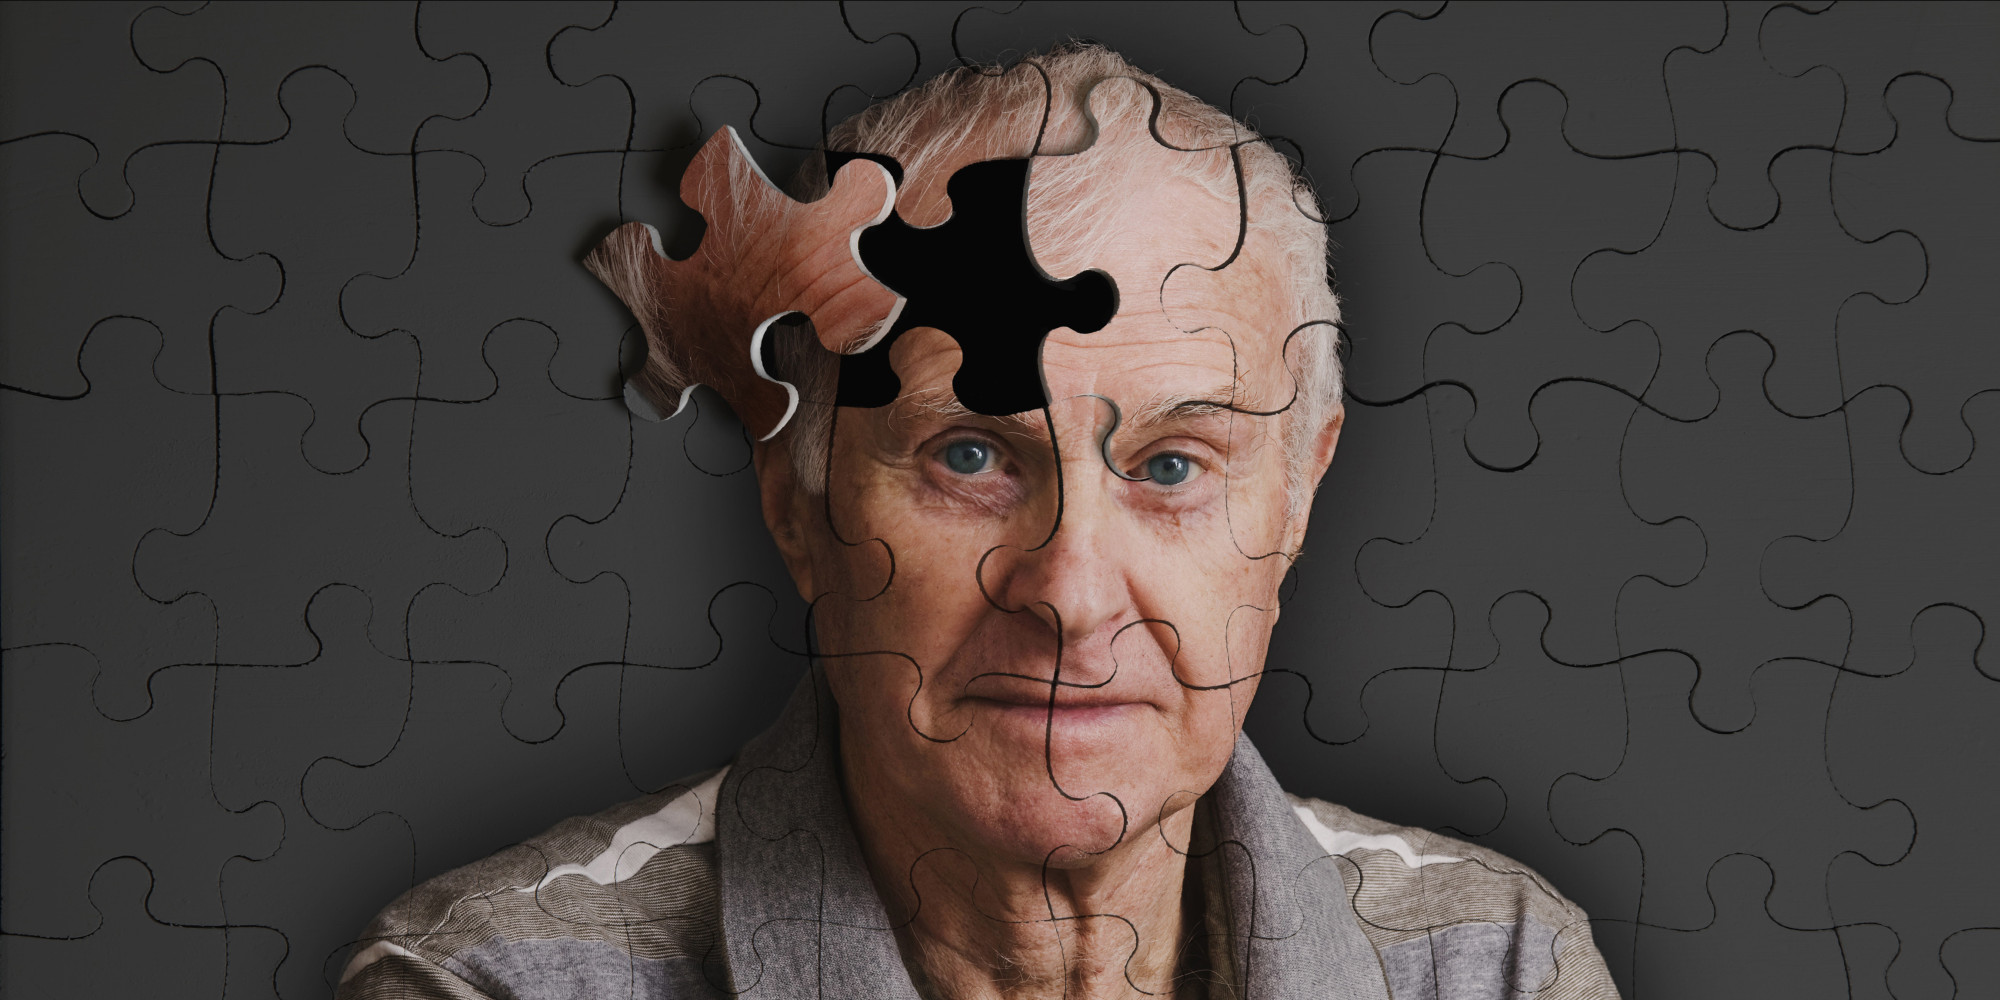 An elderly man with dementia.